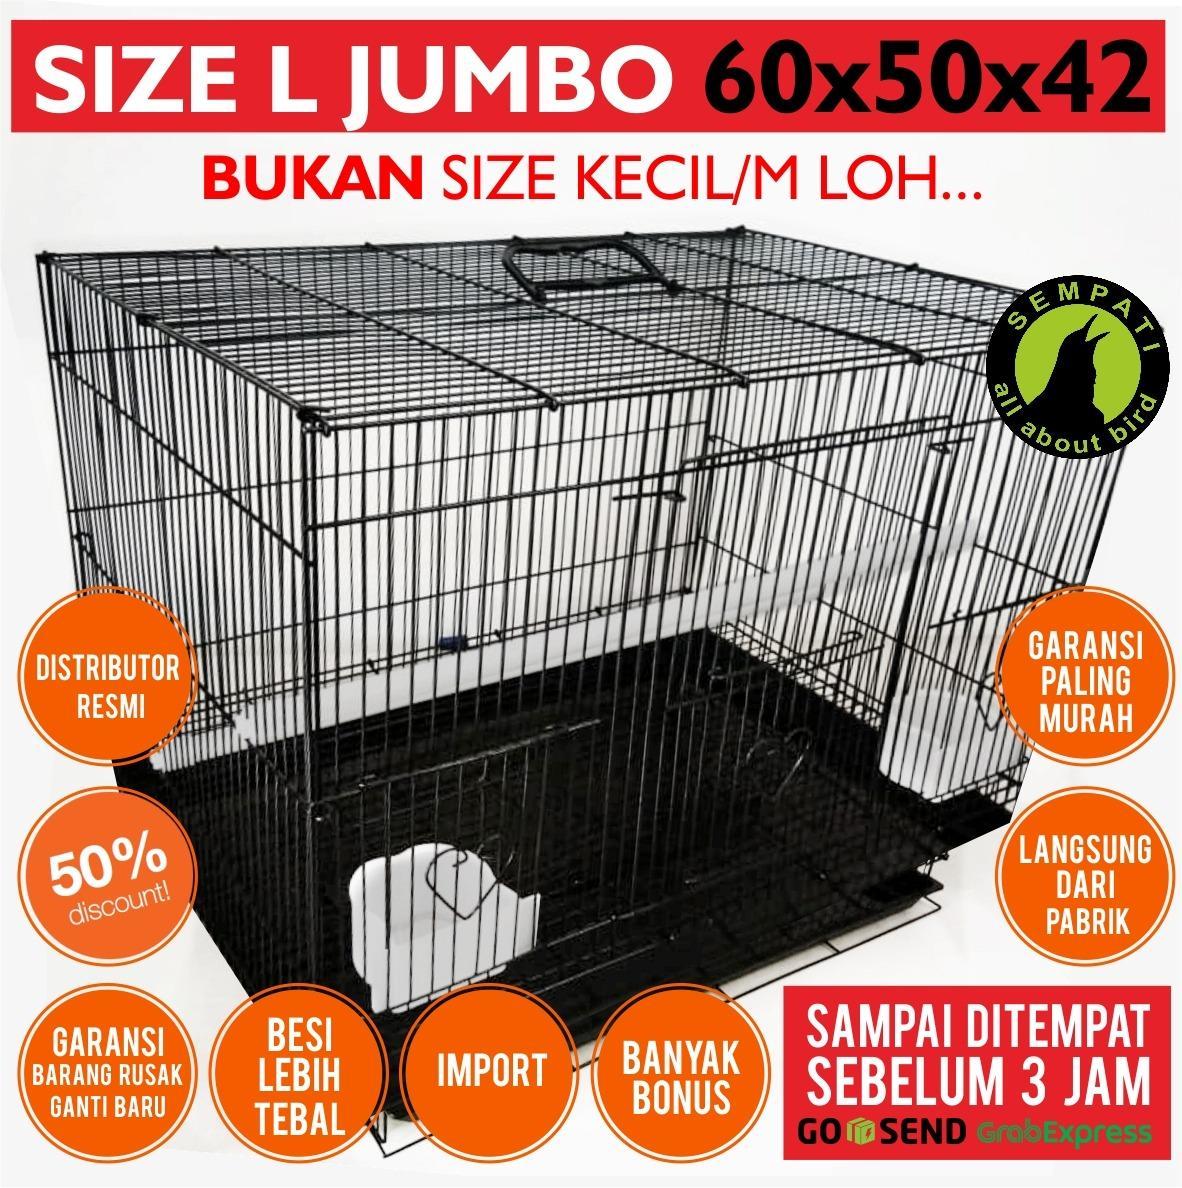 Sangkar Kandang Besi Umbaran Tebal Lipat Kotak Untuk Ternak Burung Lovebird Kucing Kelinci Anjing Sugar Glider Musang Marmut Tupai Iguana Hamster Umbaran Lazada Indonesia